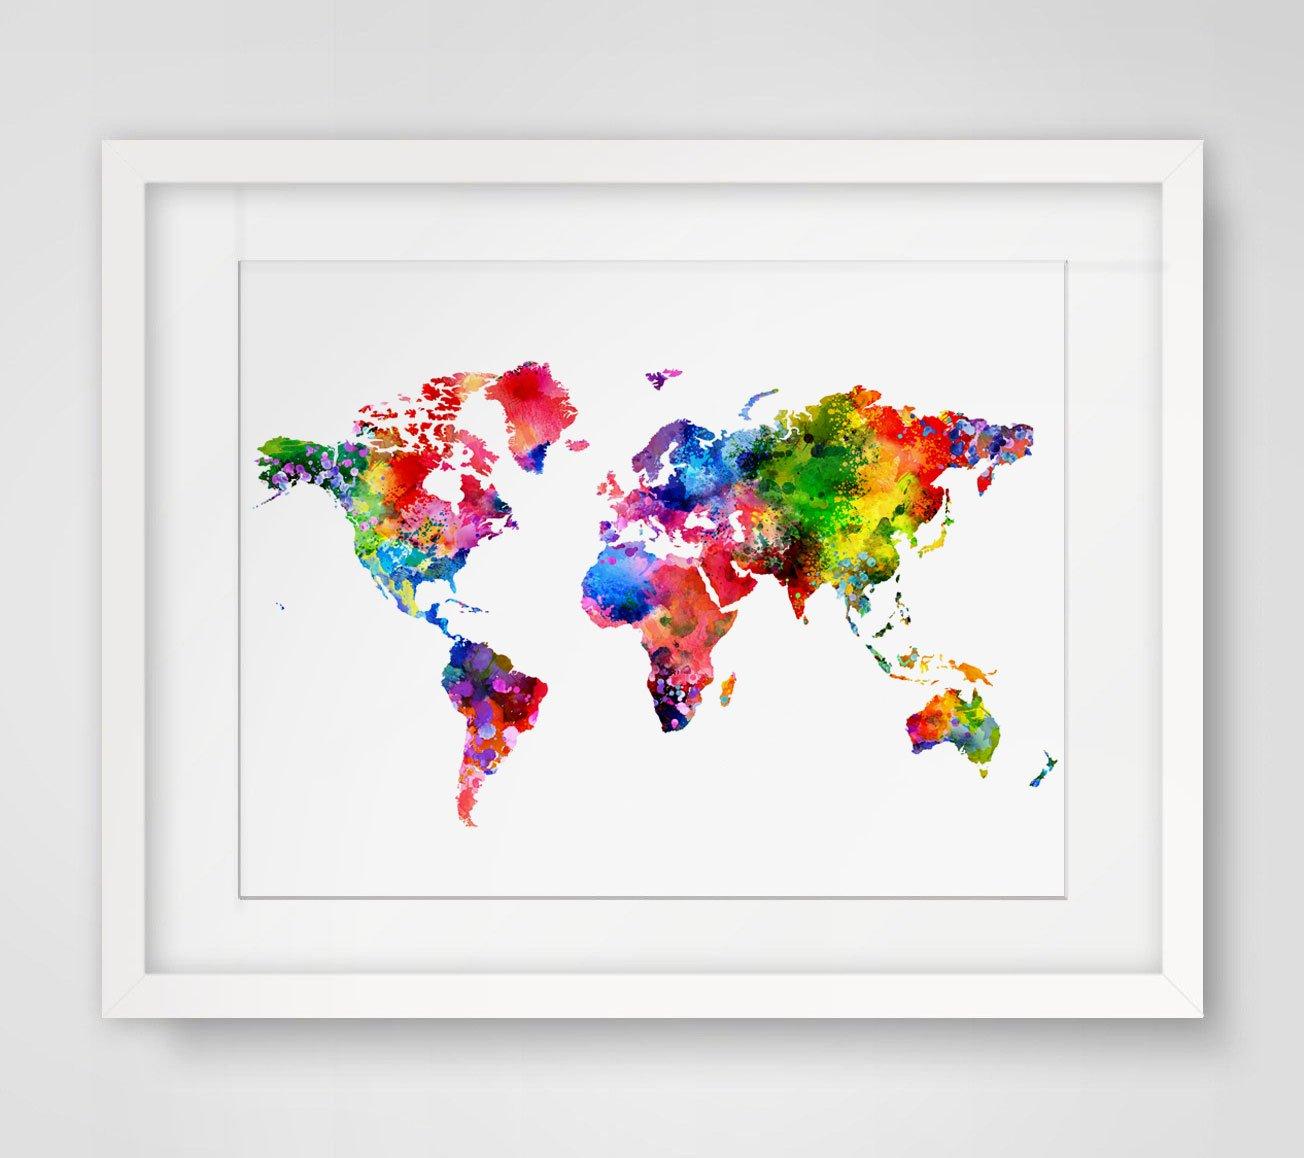 Amazon com: World Map Art Print Watercolor Poster Wall Art